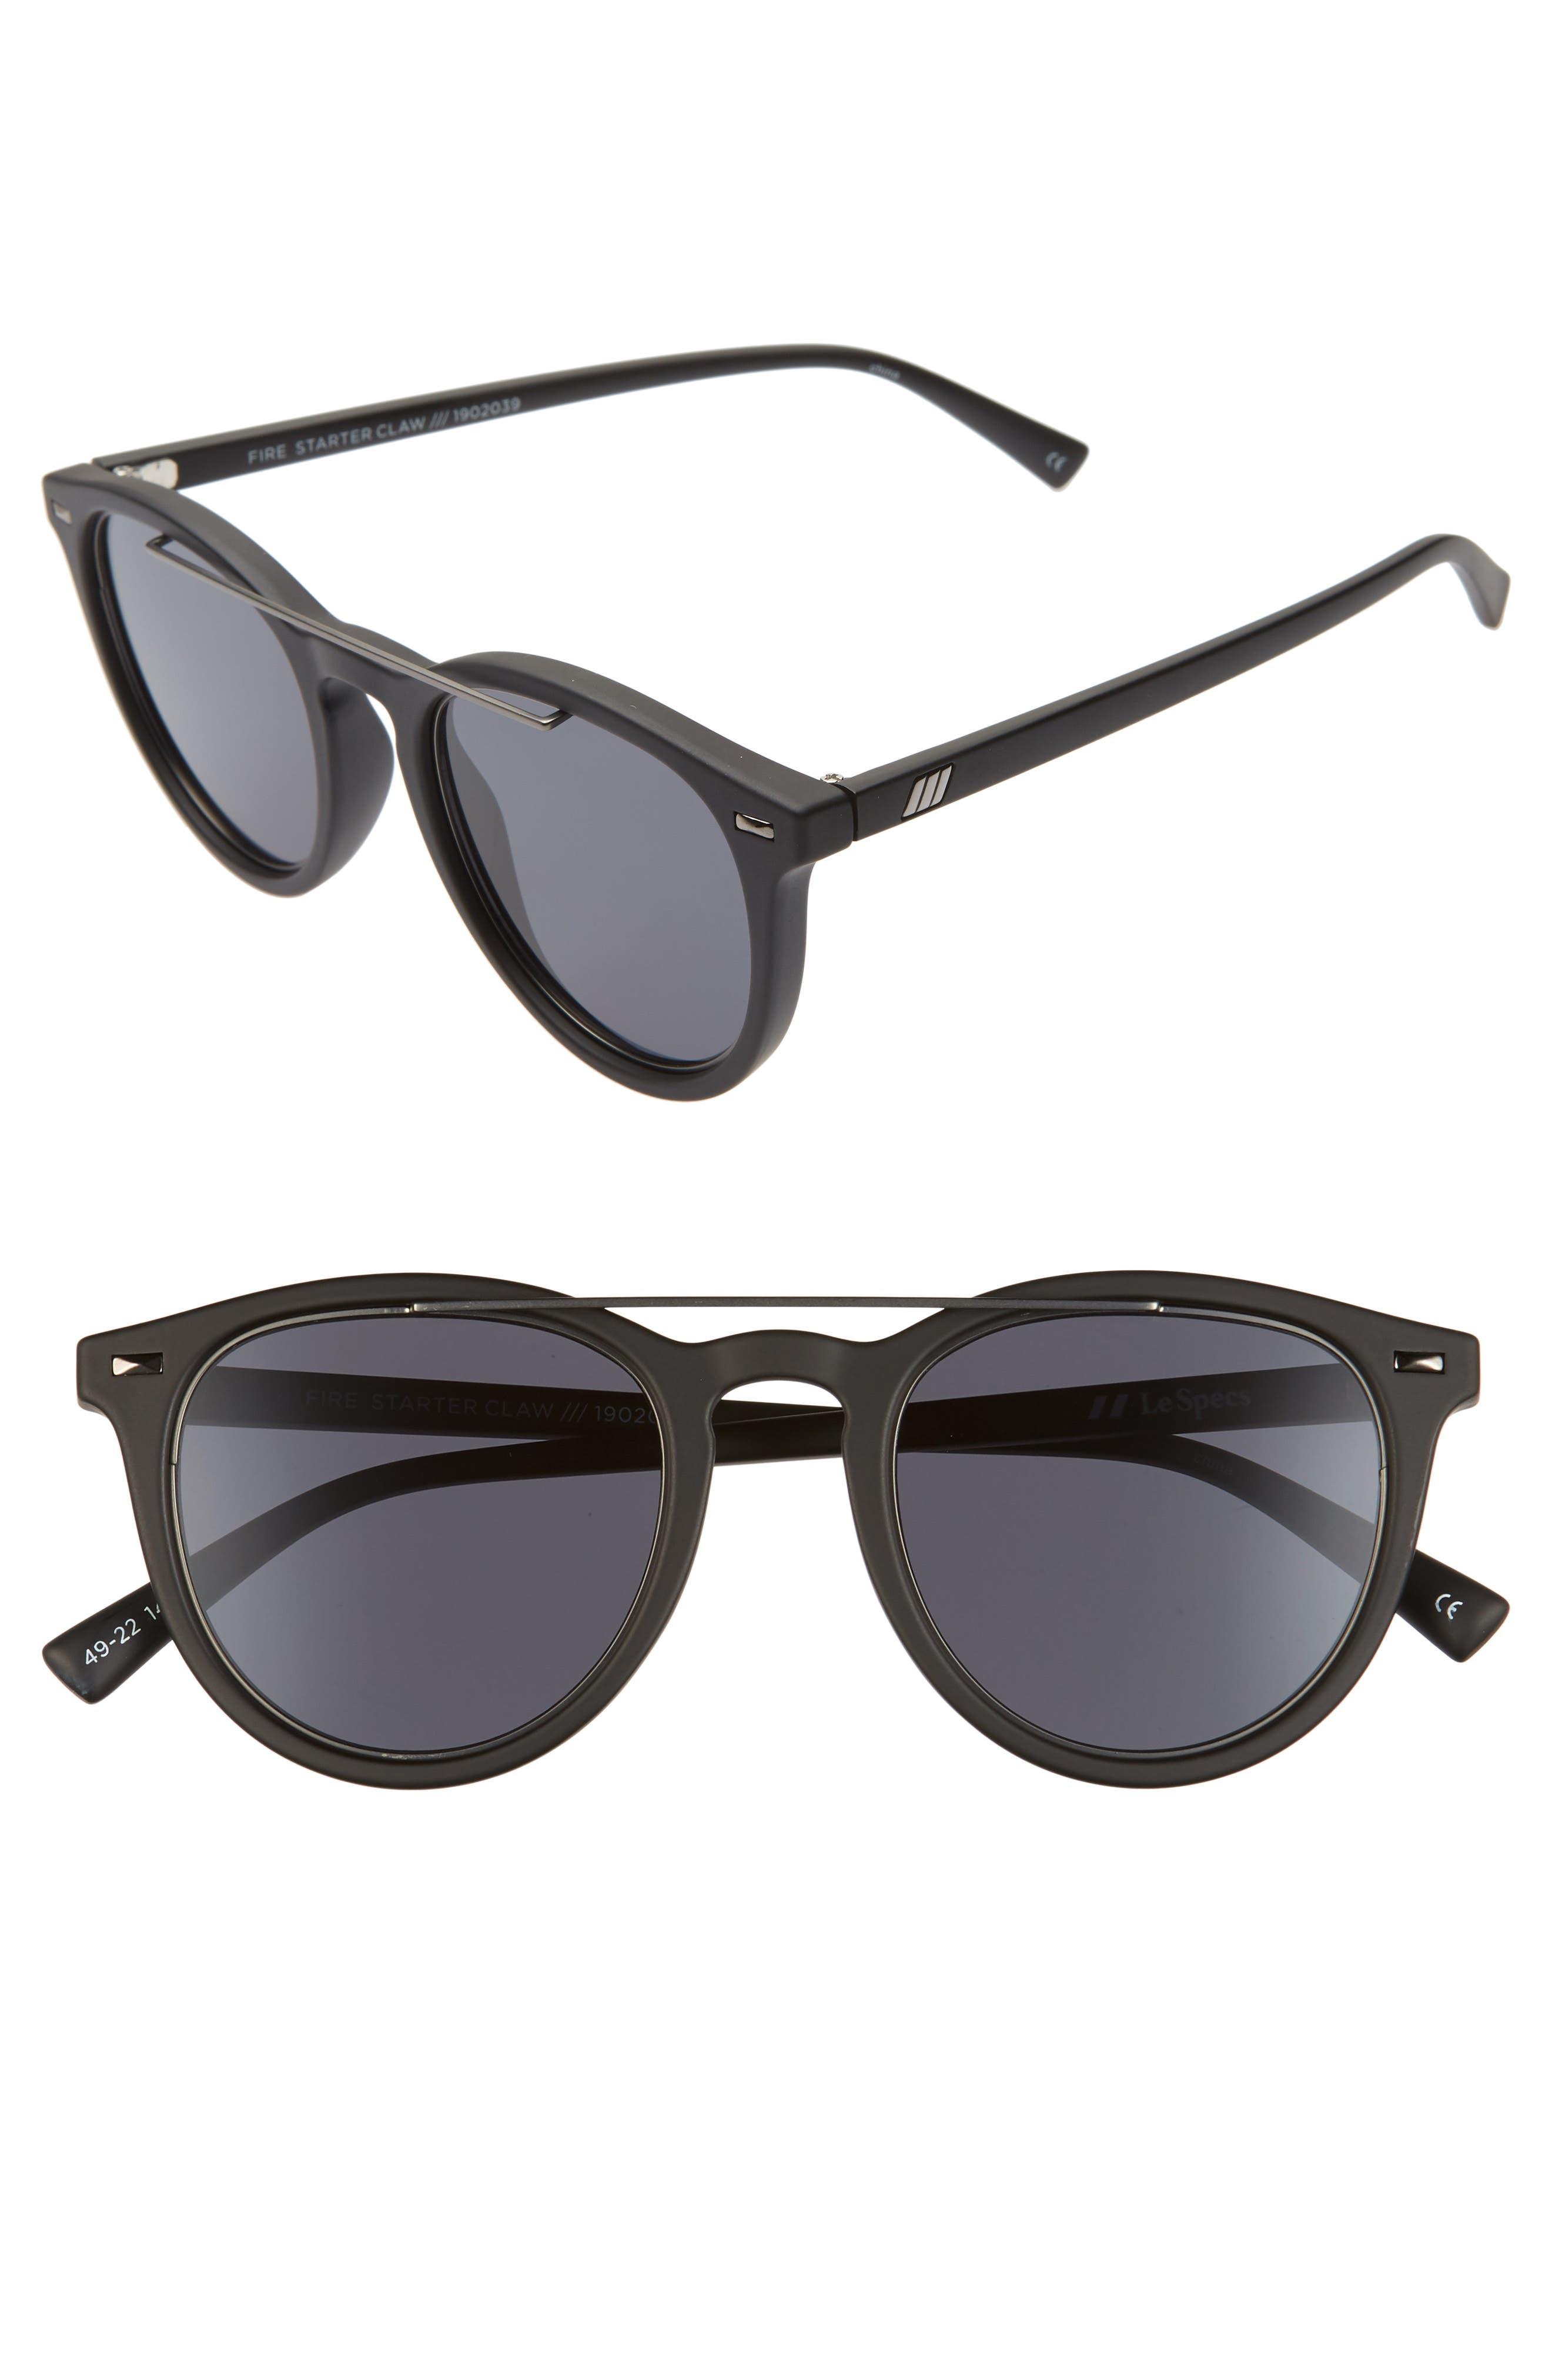 Le Specs Fire Starter 4m Round Sunglasses - Matte Black